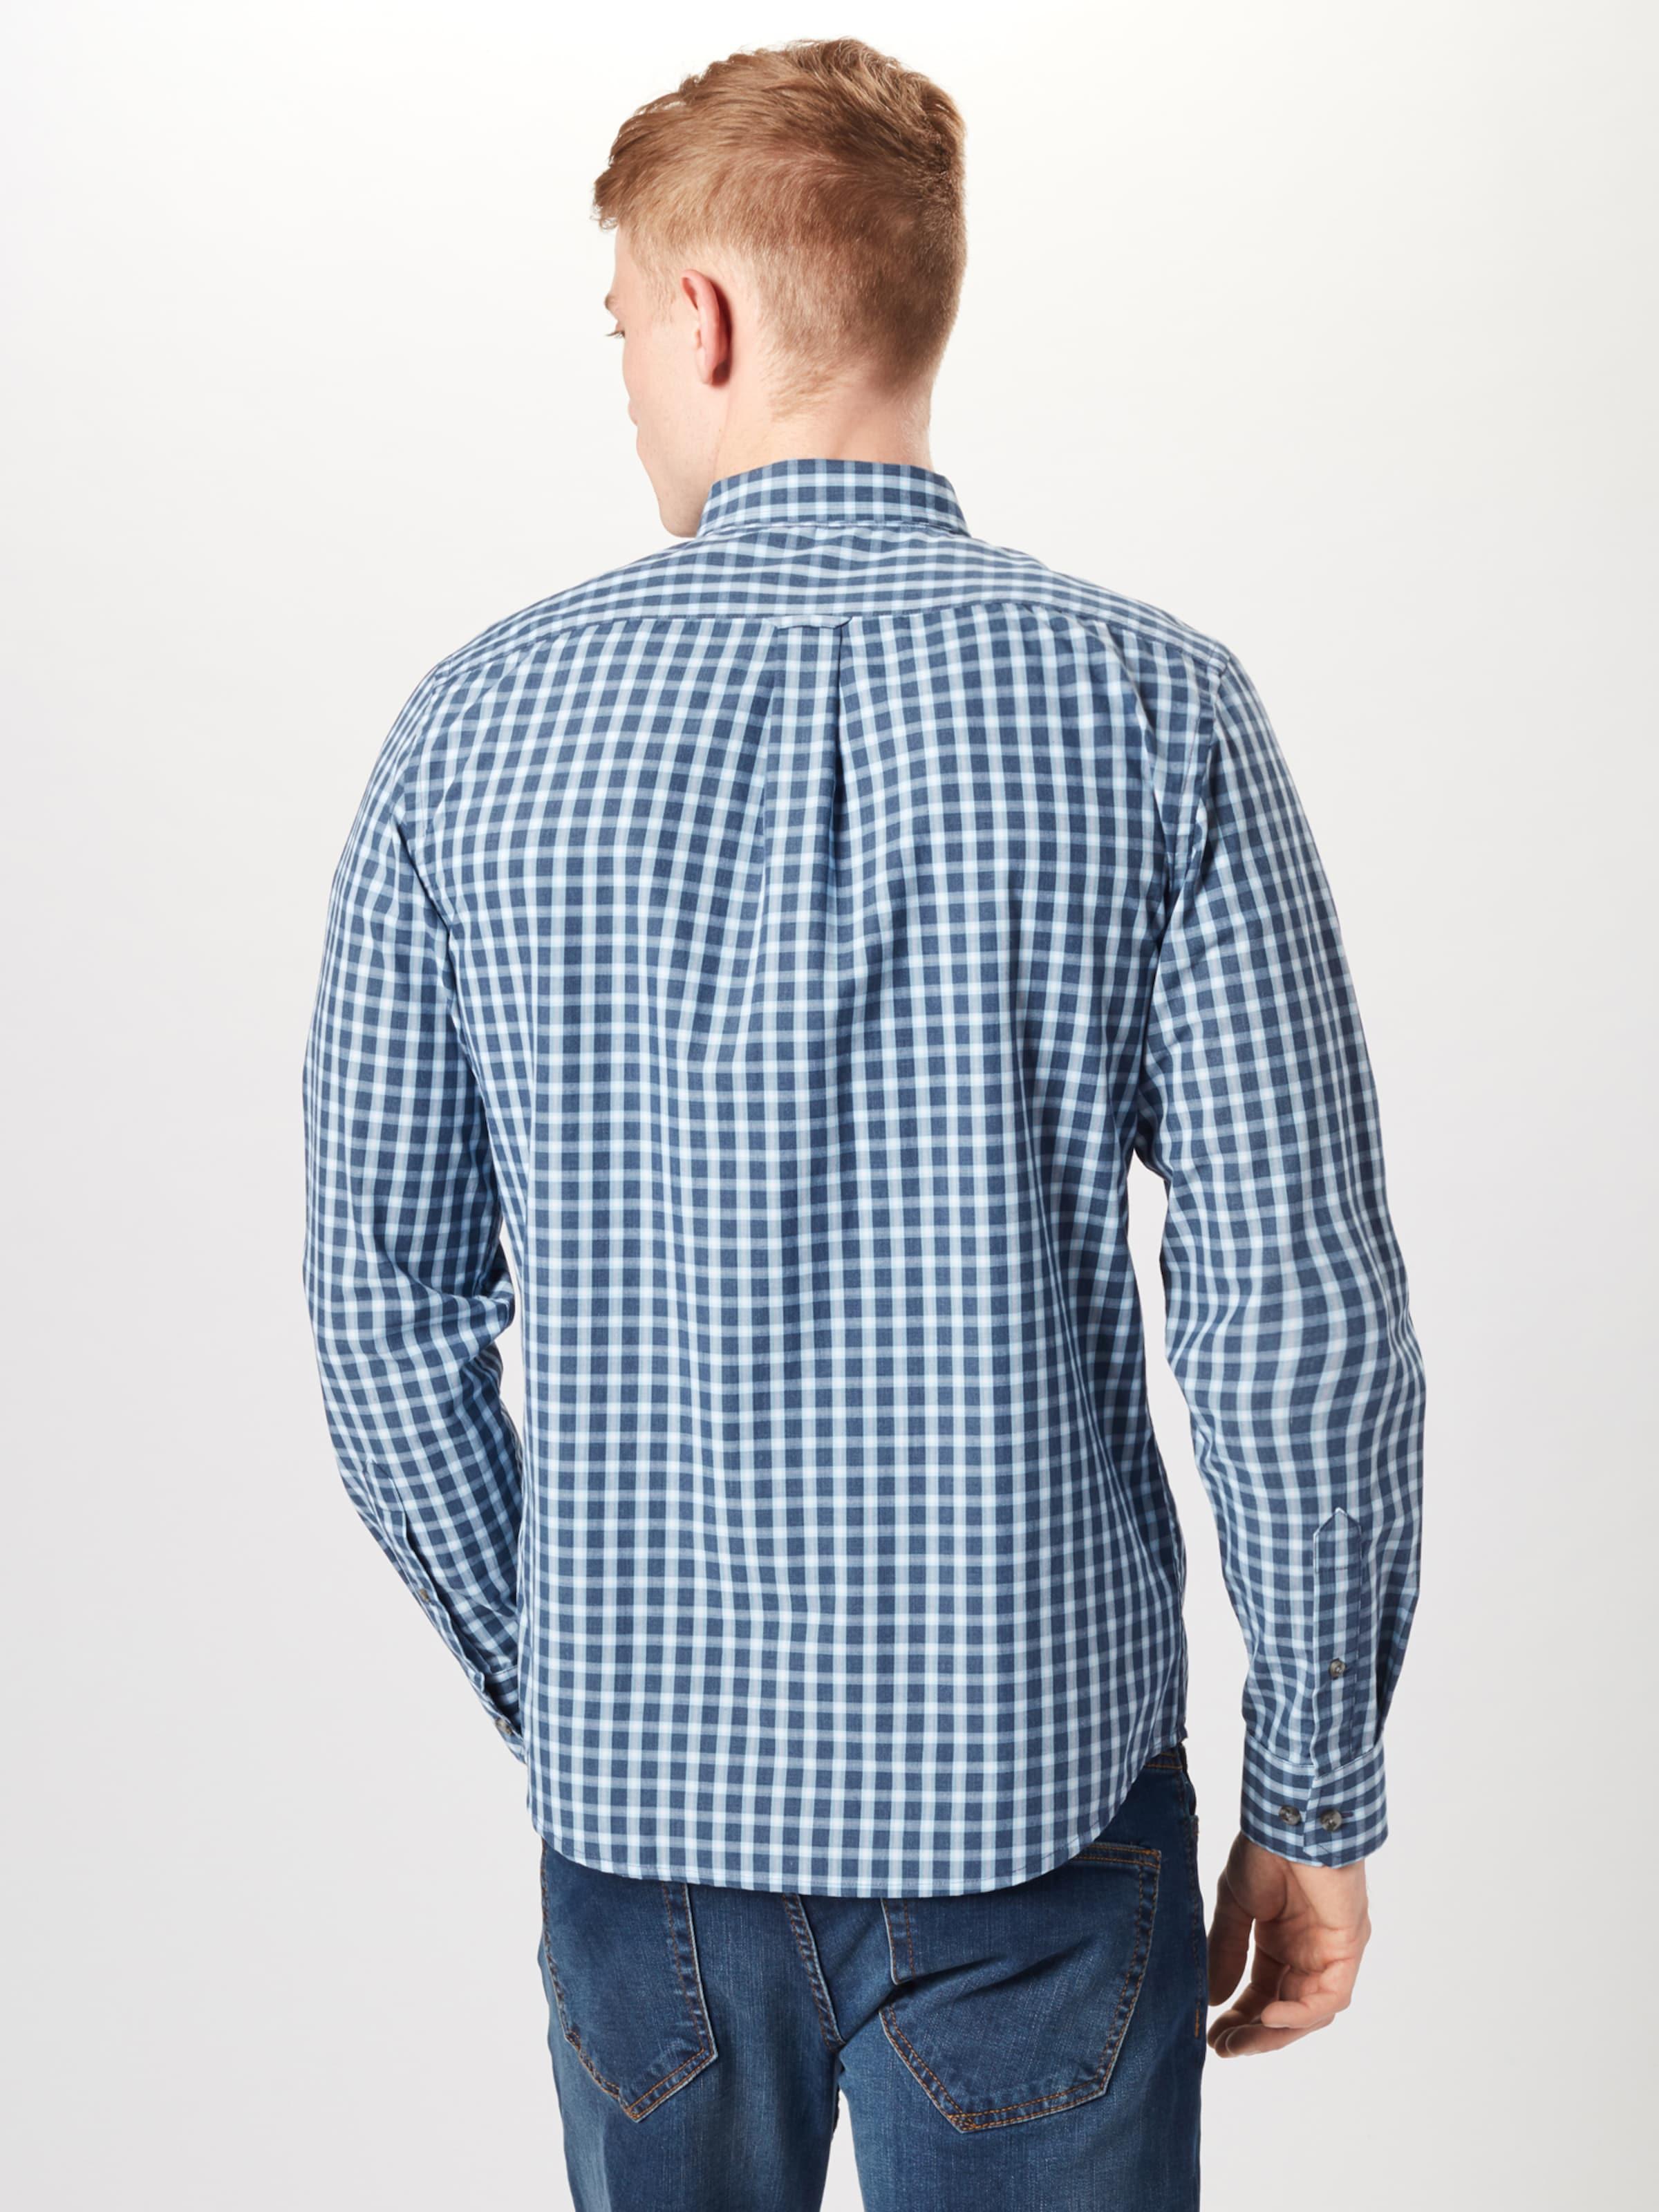 'check DunkelblauWeiß Bd In Hemd Izod Shirt' CxrdoBe